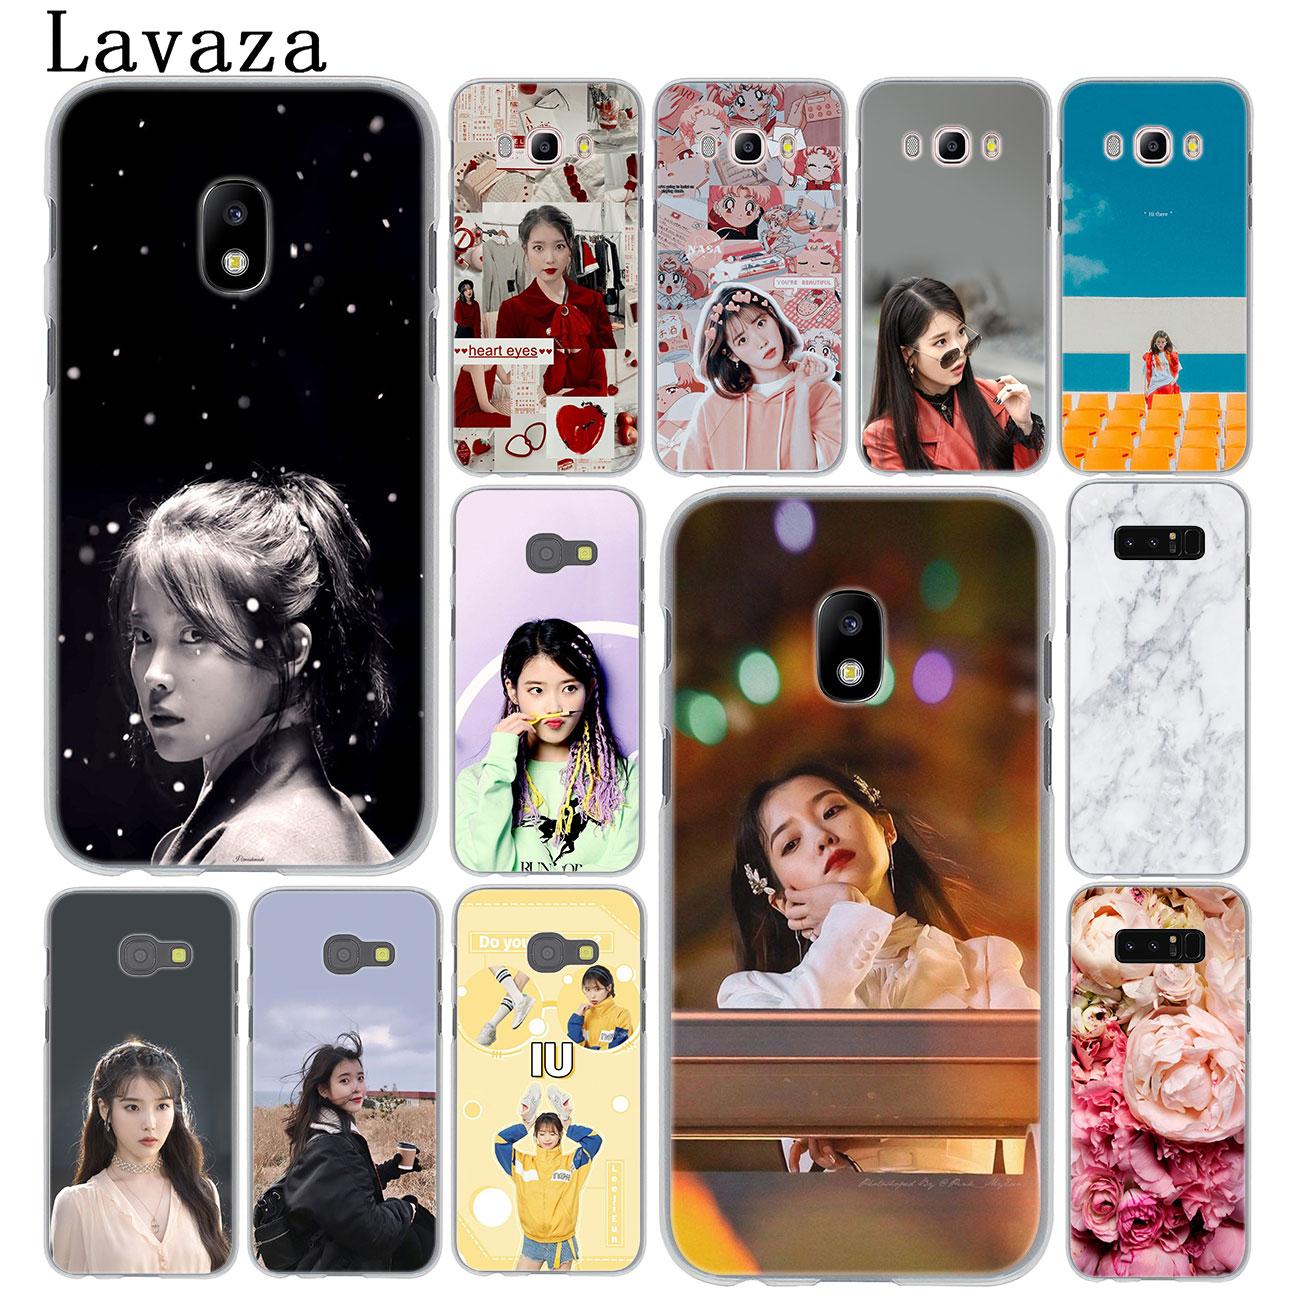 Iu papel tapiz POP funda de teléfono para Samsung Galaxy J8 J7 Duo J6 J5 J4 Plus 2018 2017 2016 2015 J2 J3 Prime UE EE. UU.